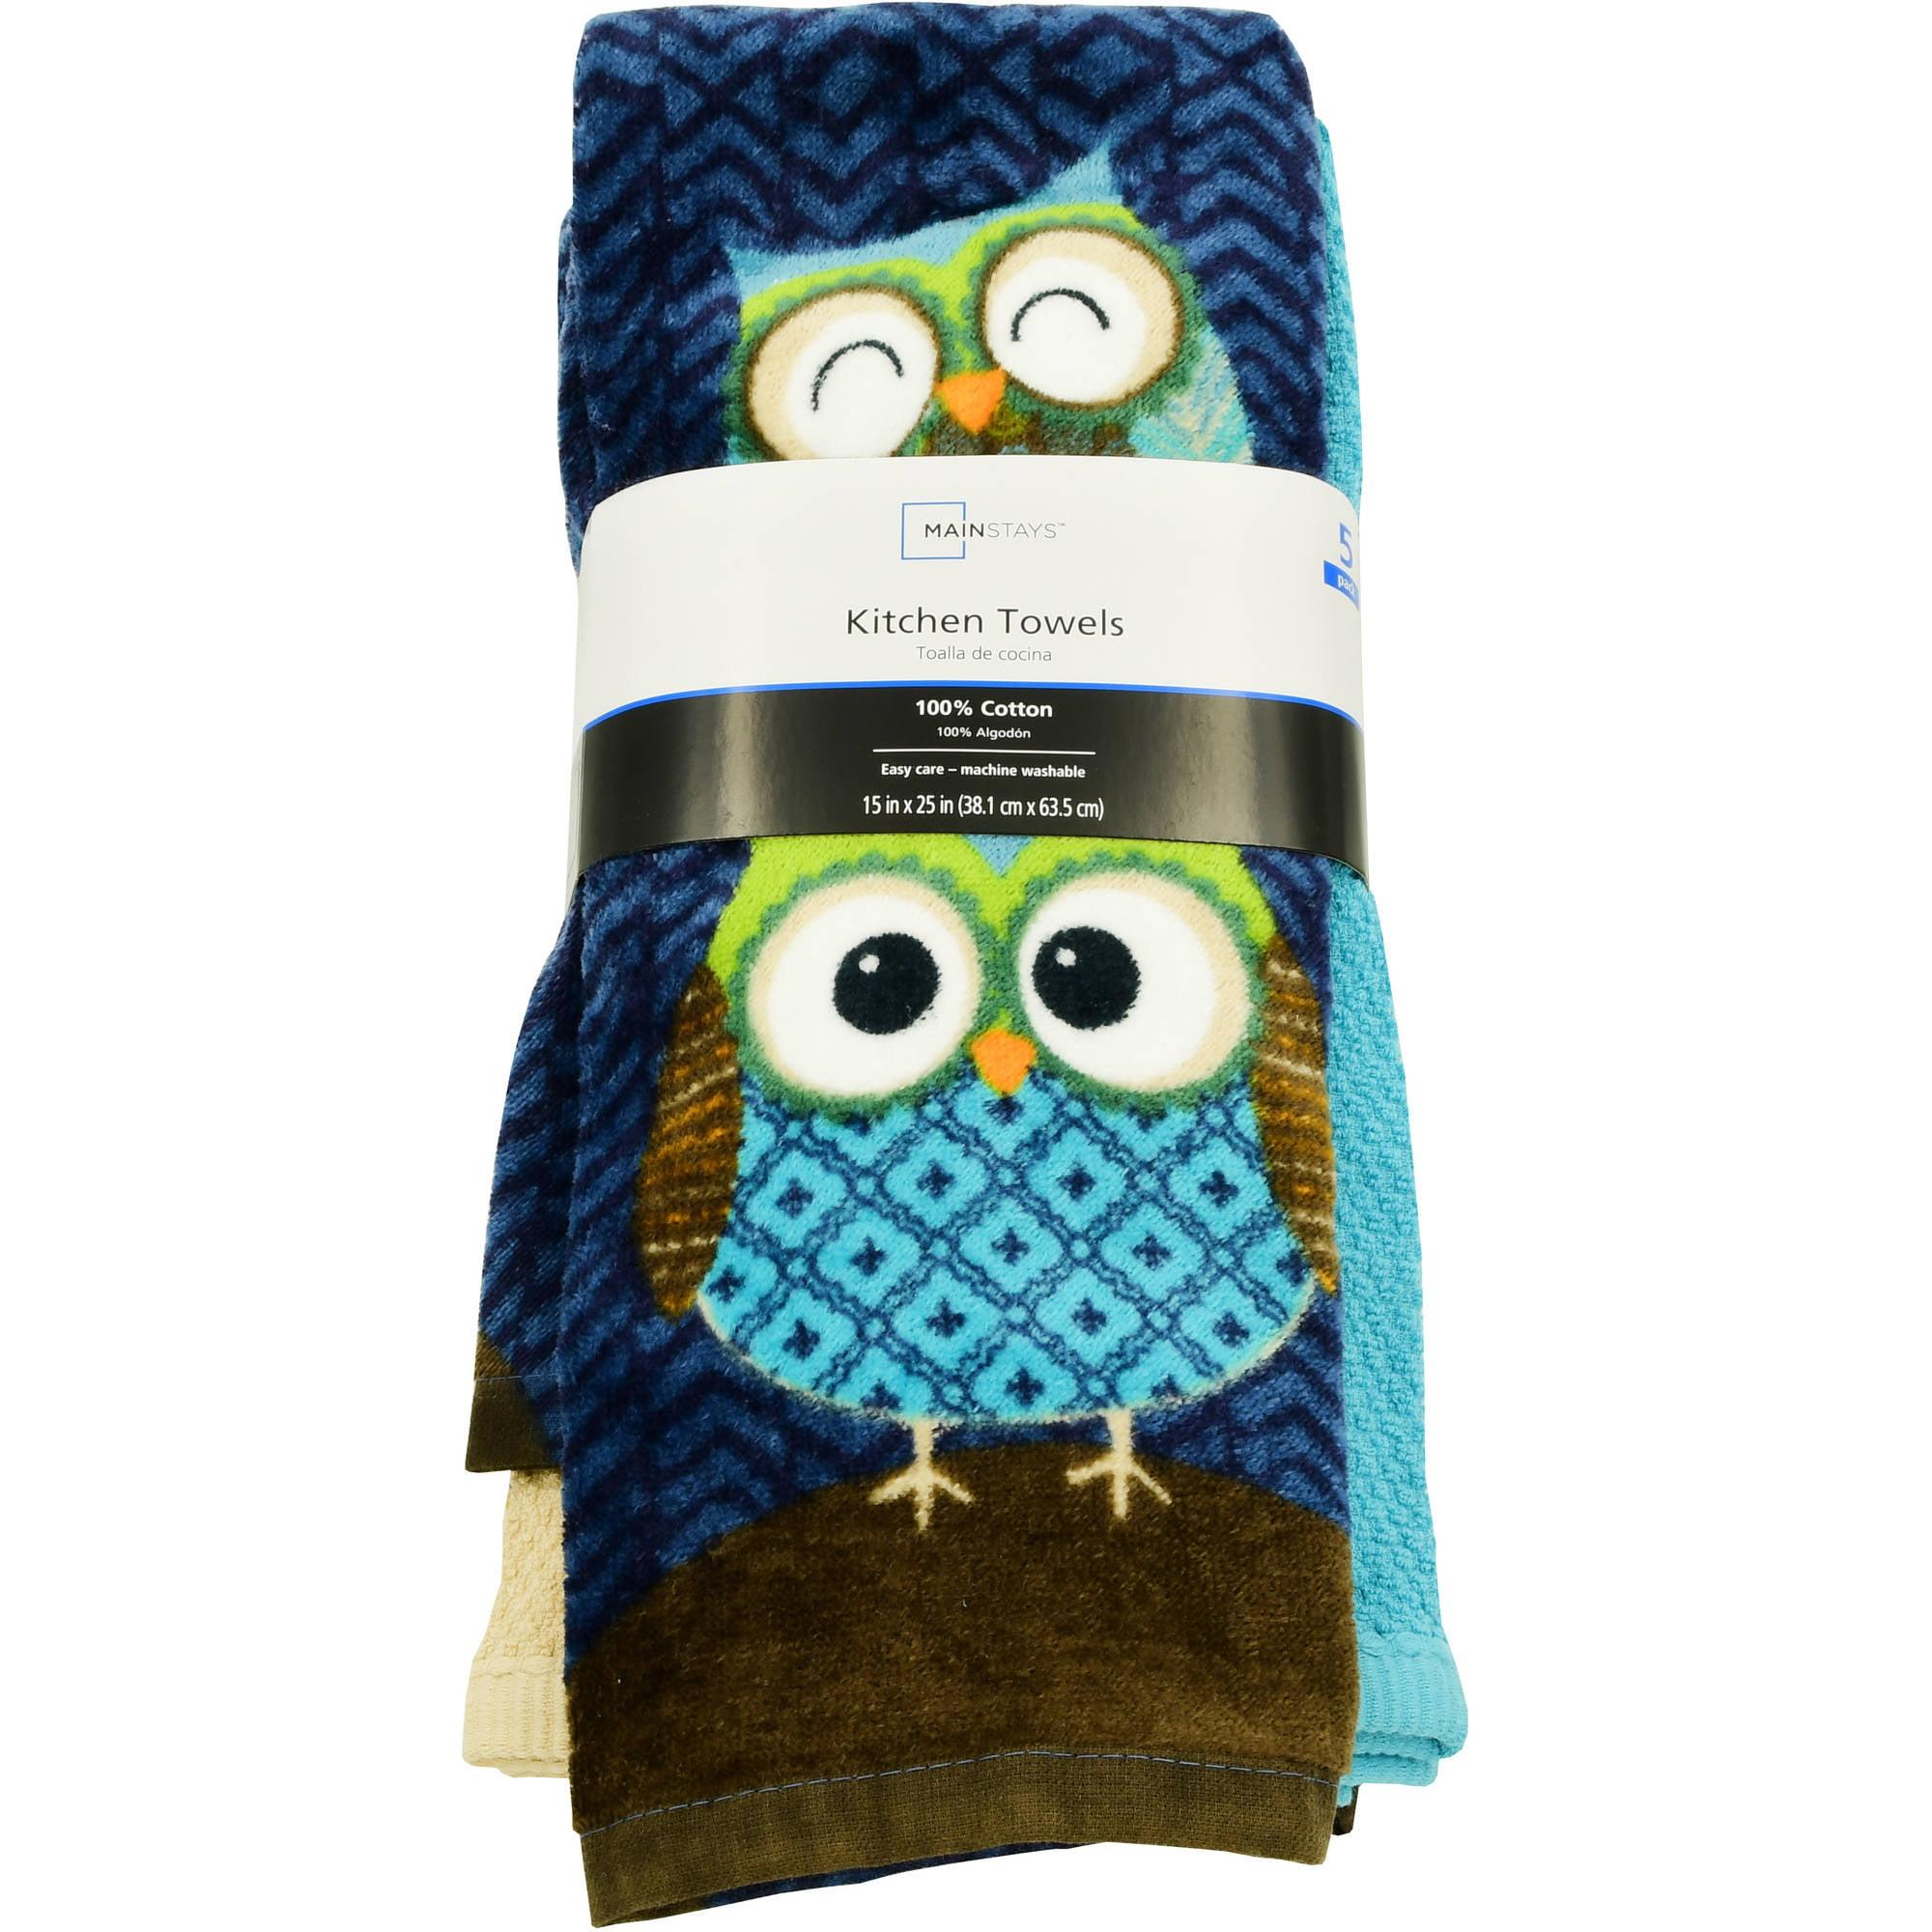 Mainstays Owls 5pc Kitchen Towel Walmart